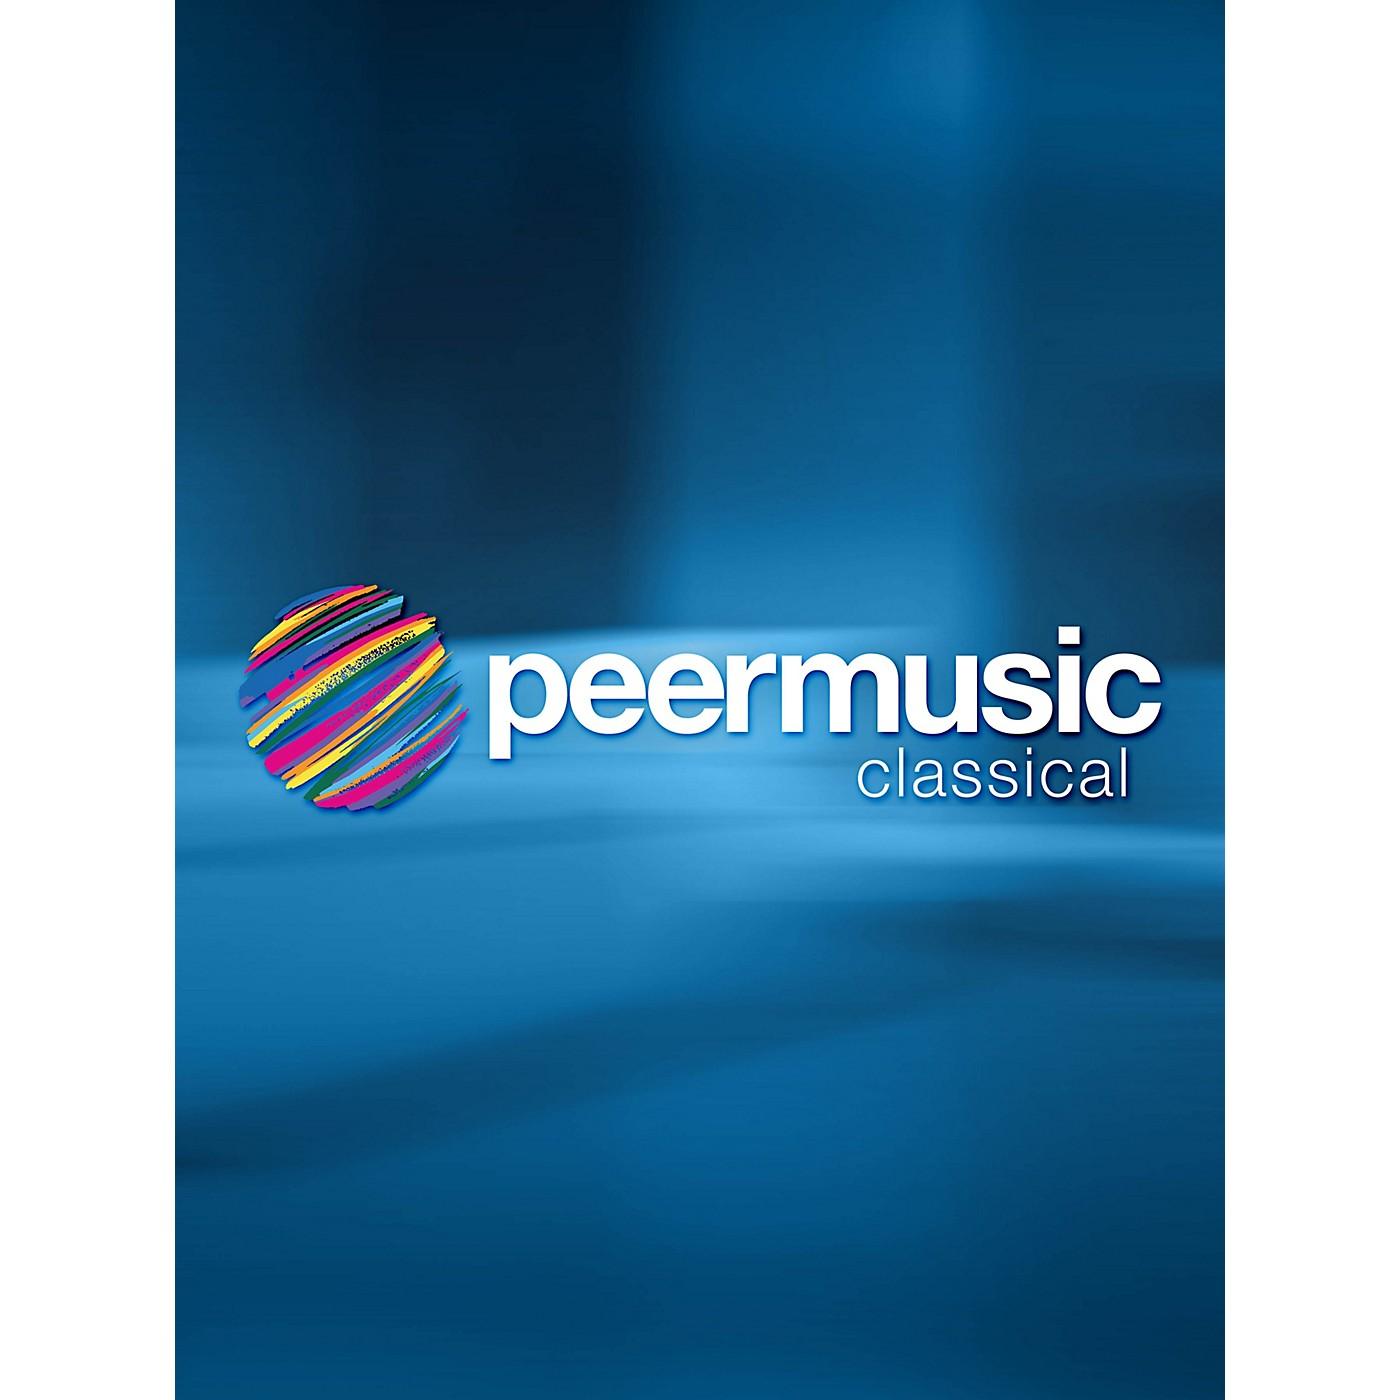 Peer Music 5 Preludios (Piano Solo) Peermusic Classical Series Softcover thumbnail